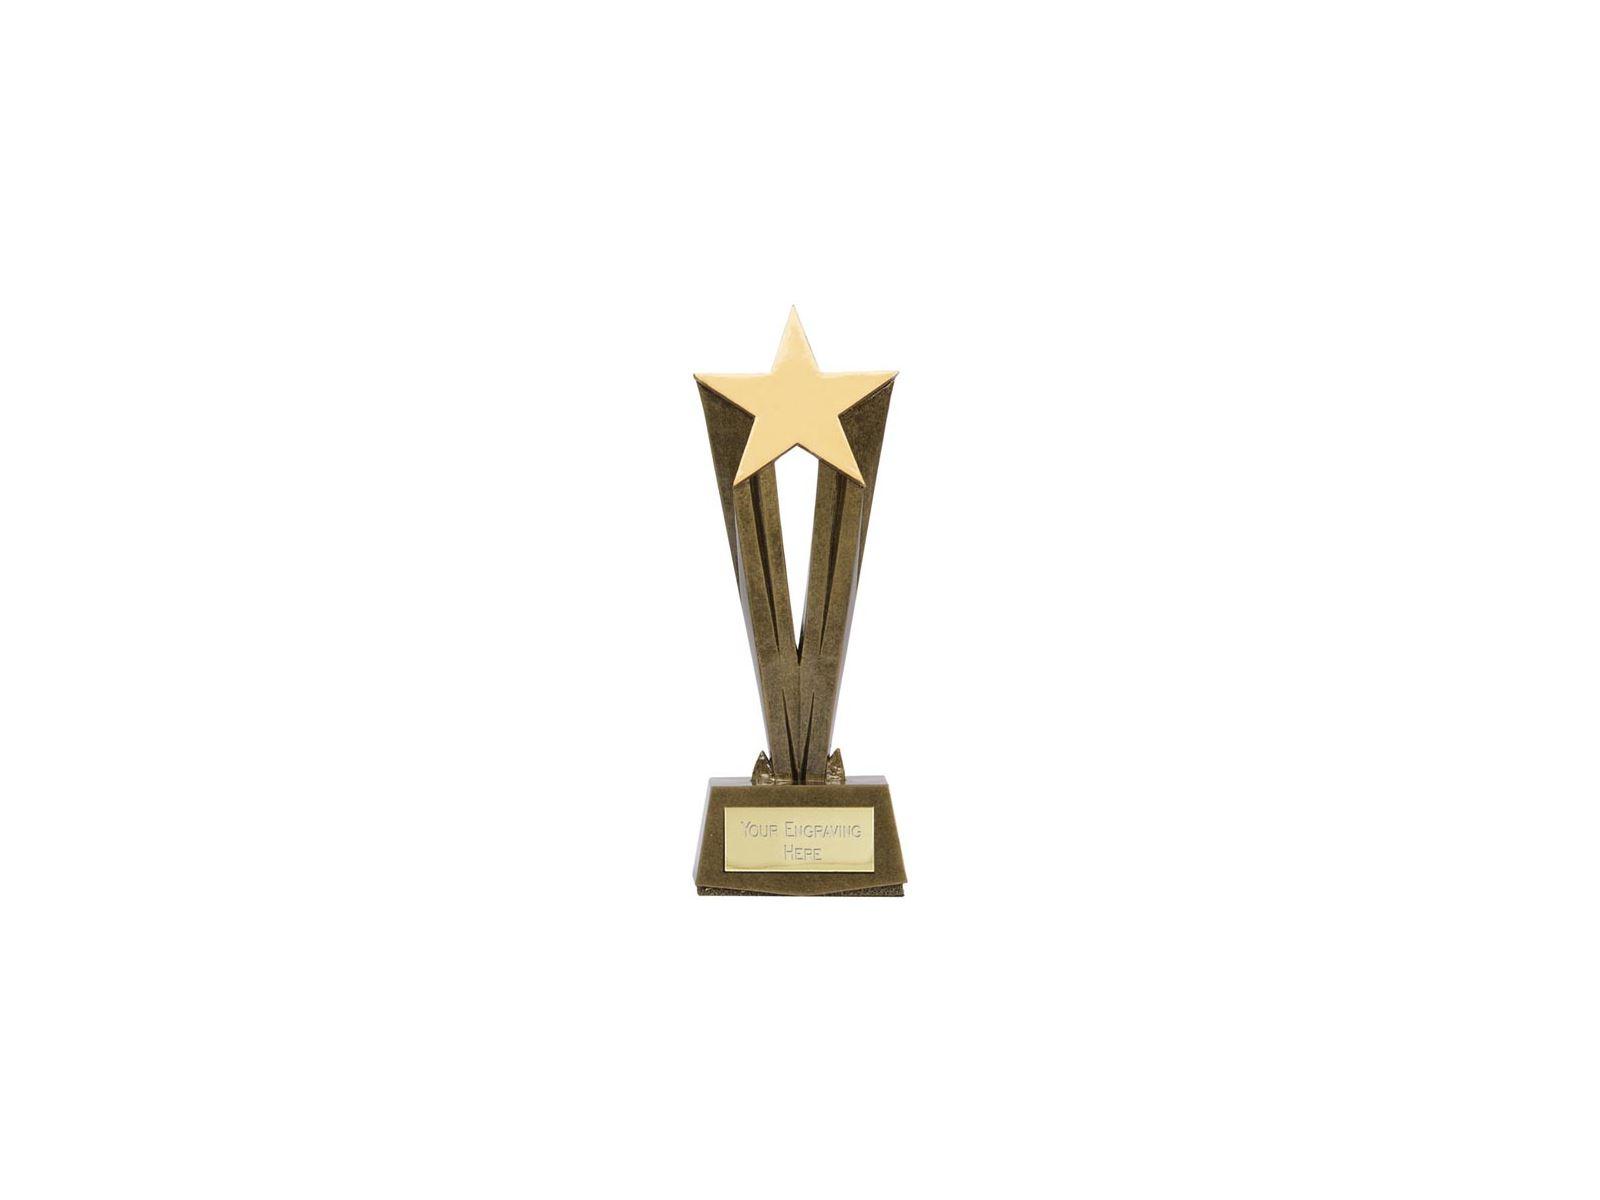 Antique Gold Resin Cherish Star Trophy 17cm 675